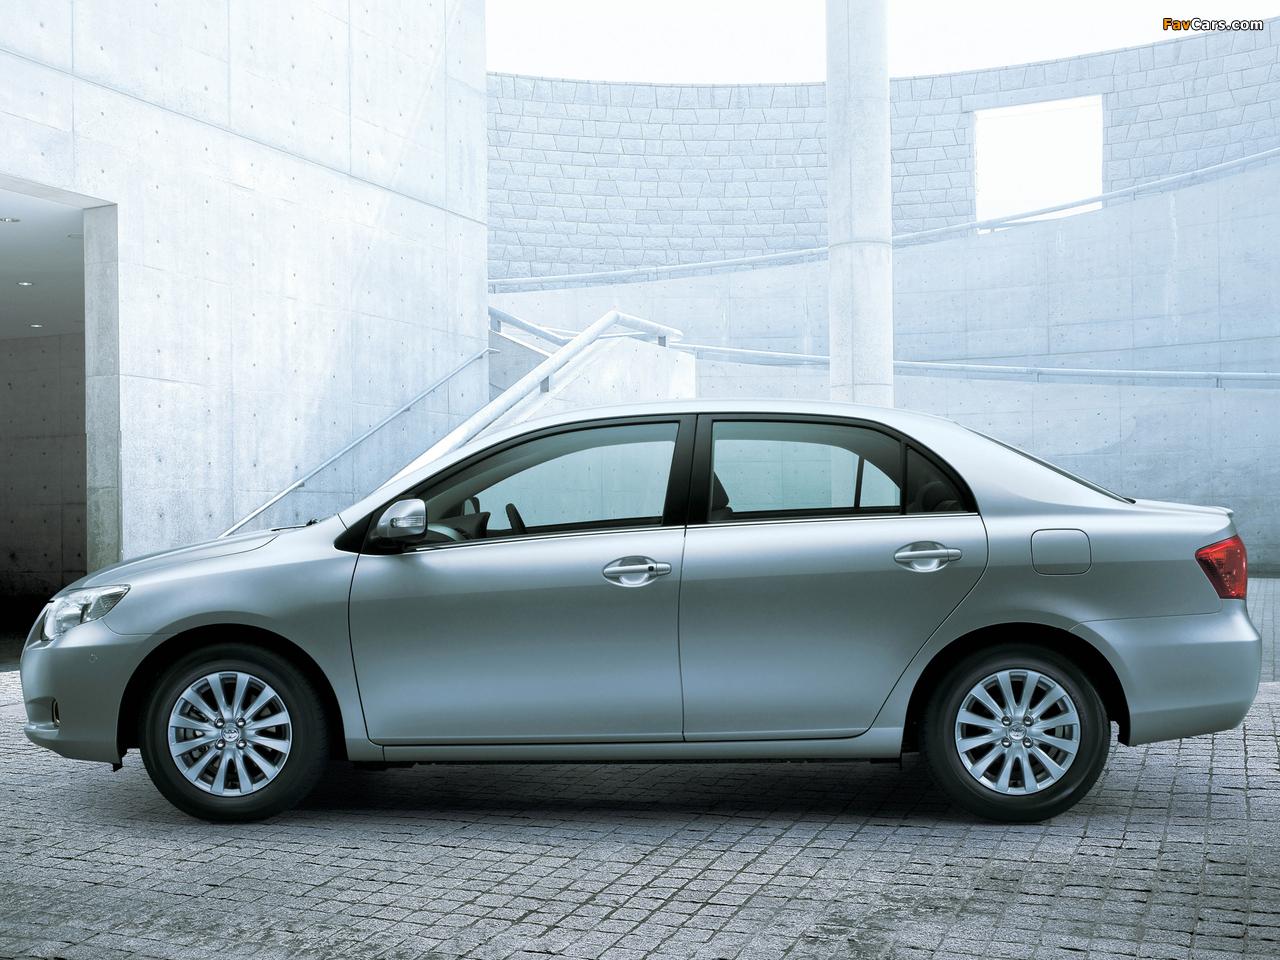 Images Of Toyota Corolla Axio 2006 08 1280x960